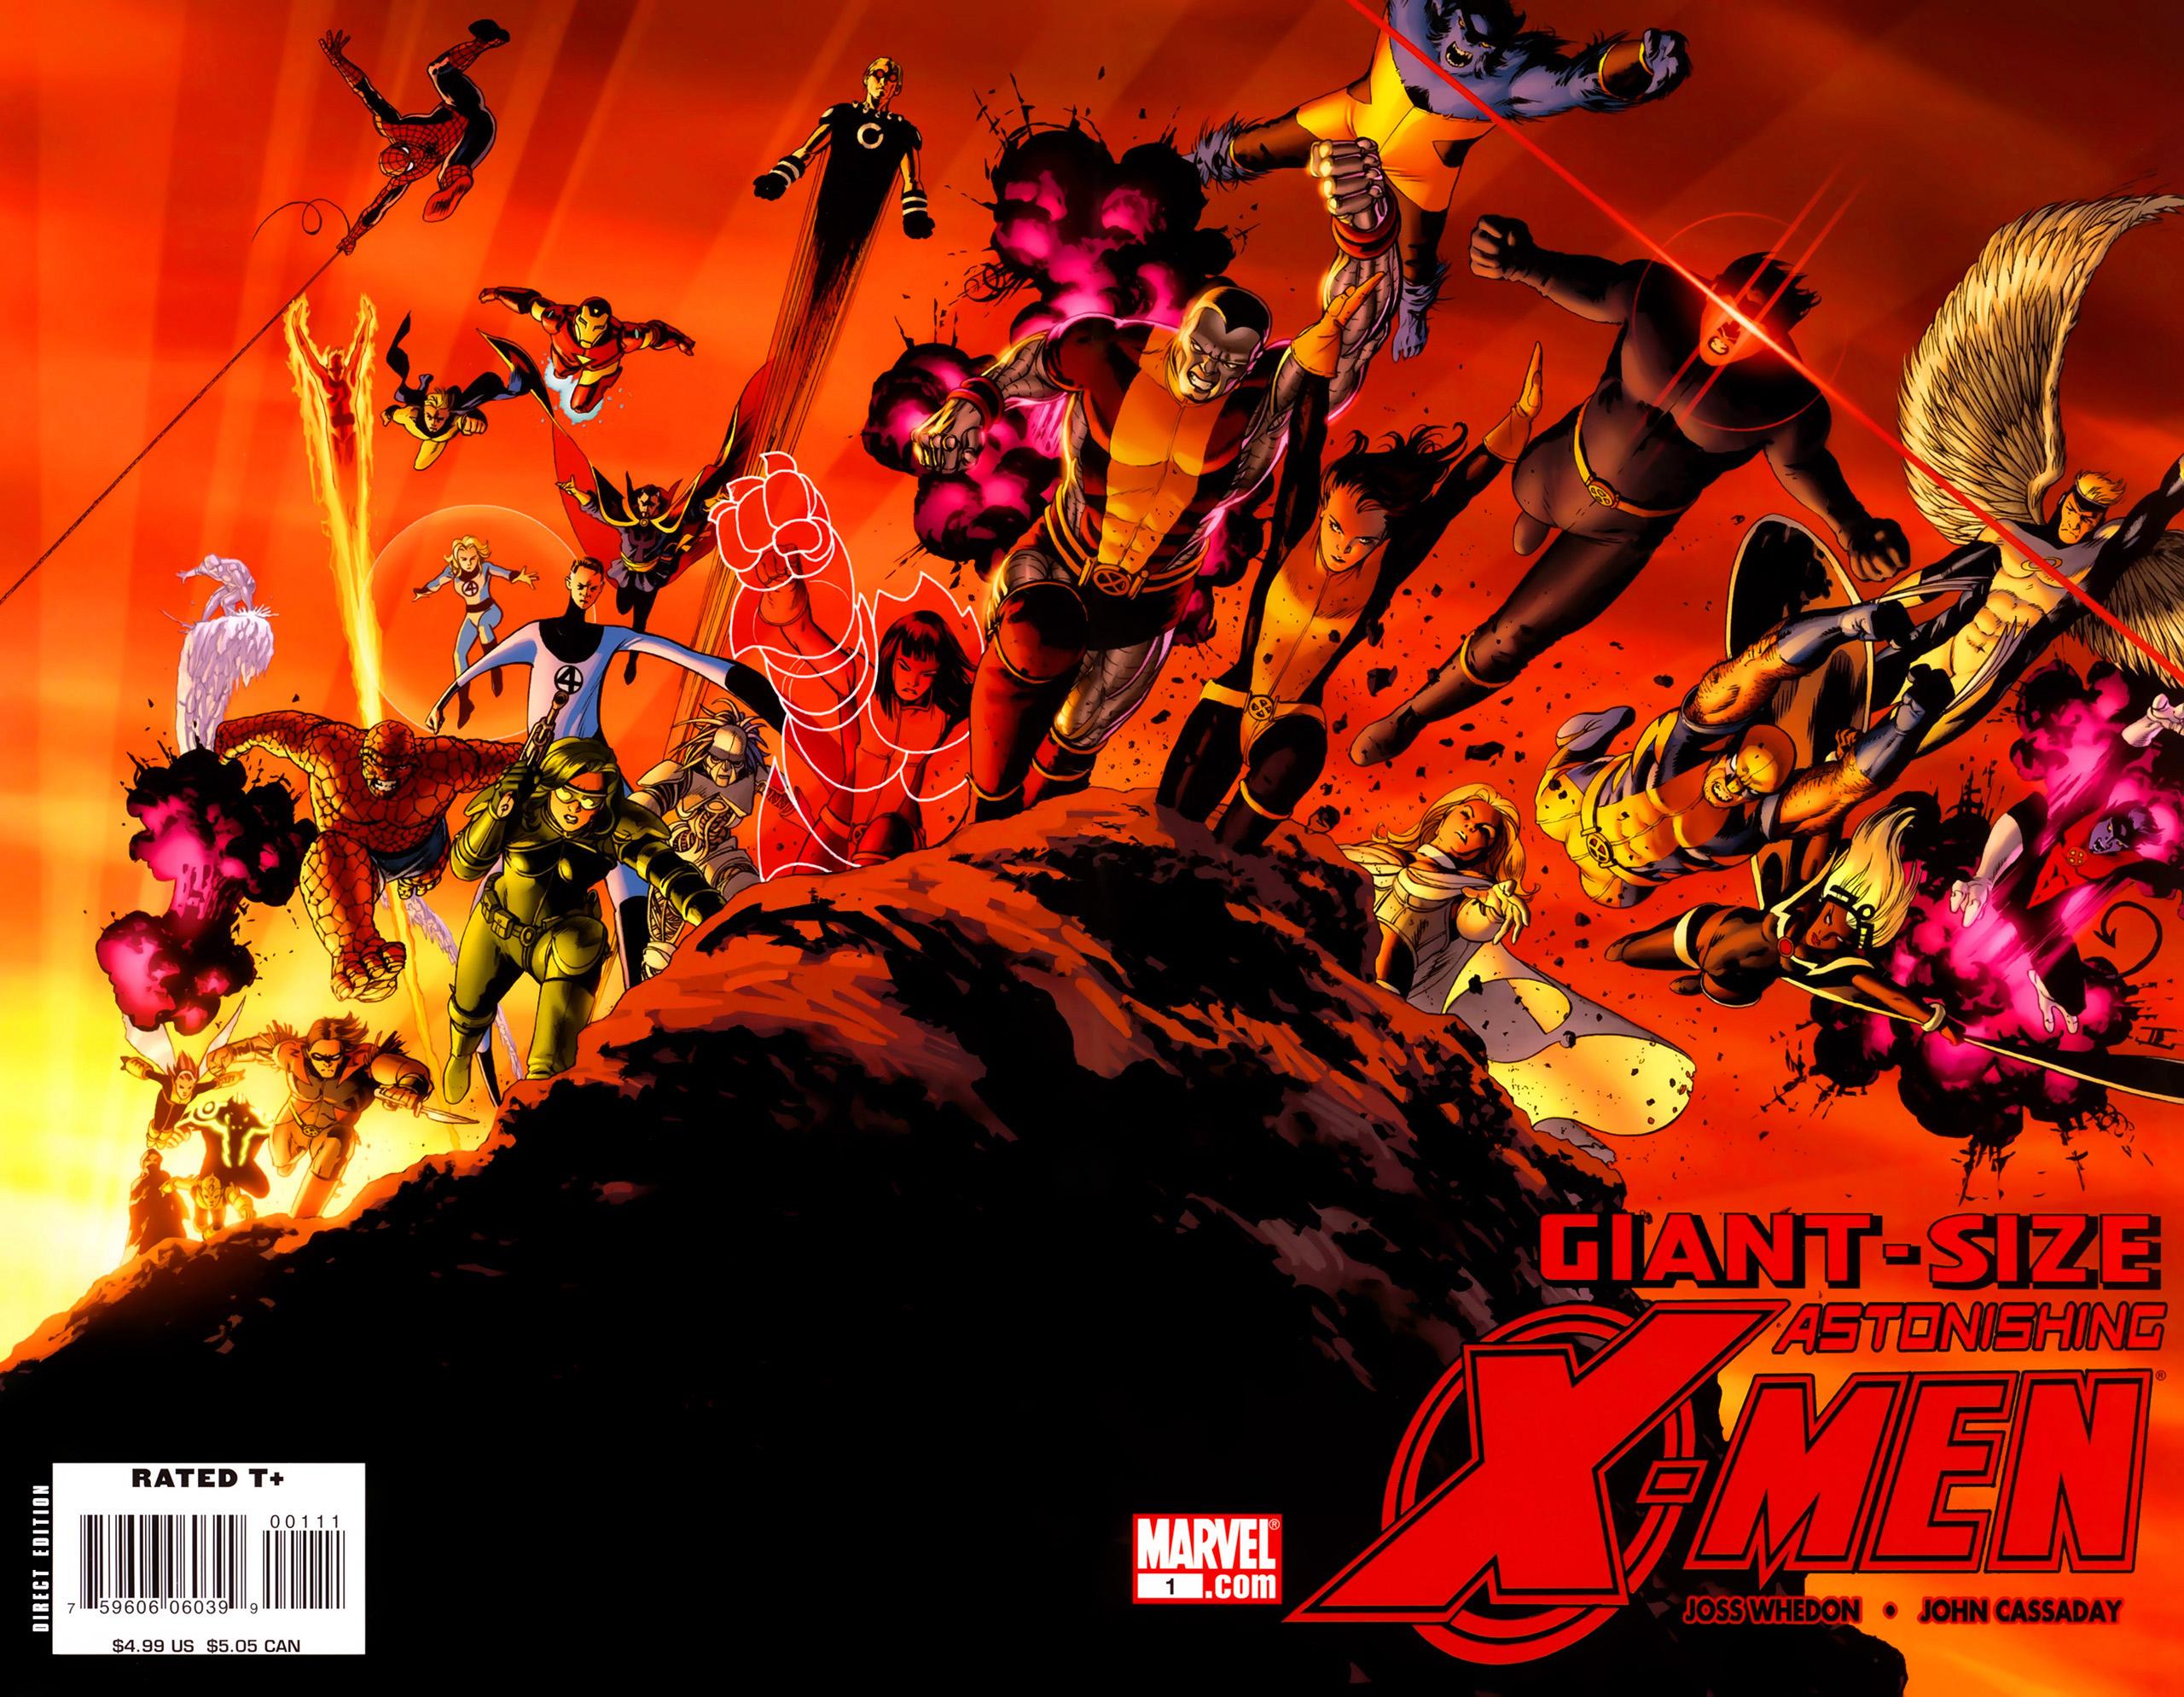 Read online Giant-Size Astonishing X-Men comic -  Issue # Full - 1